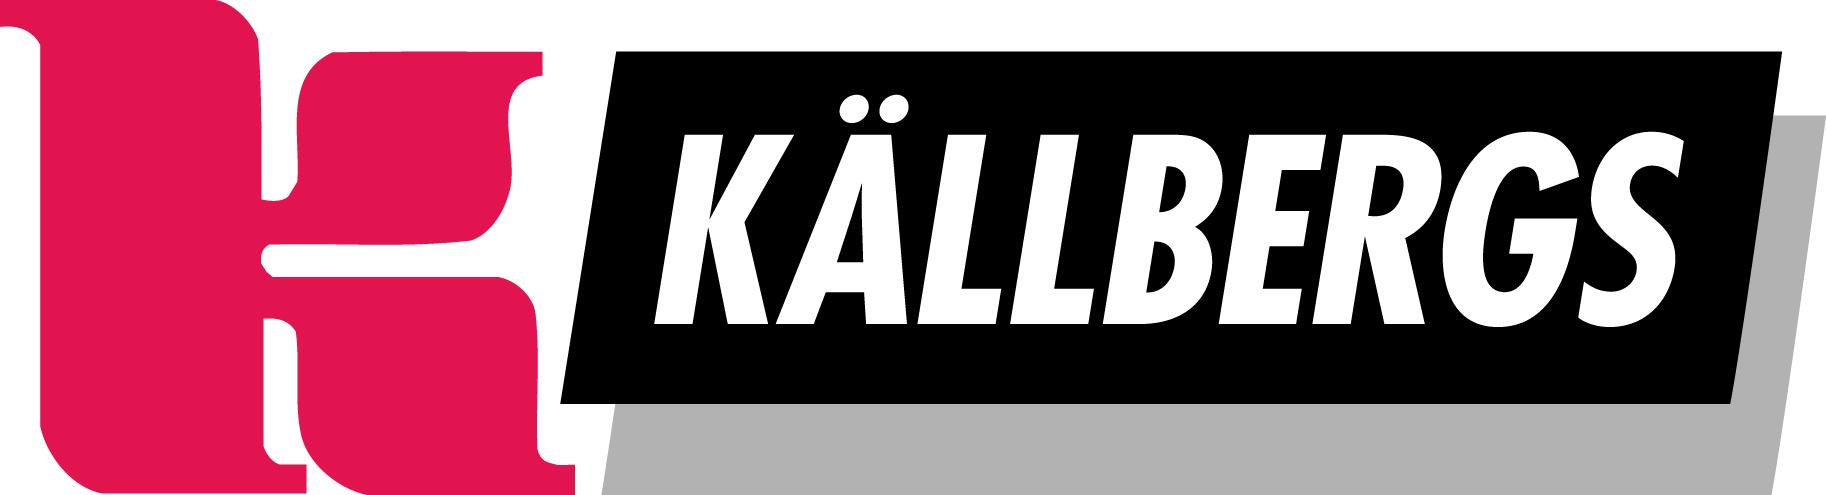 Källbergs